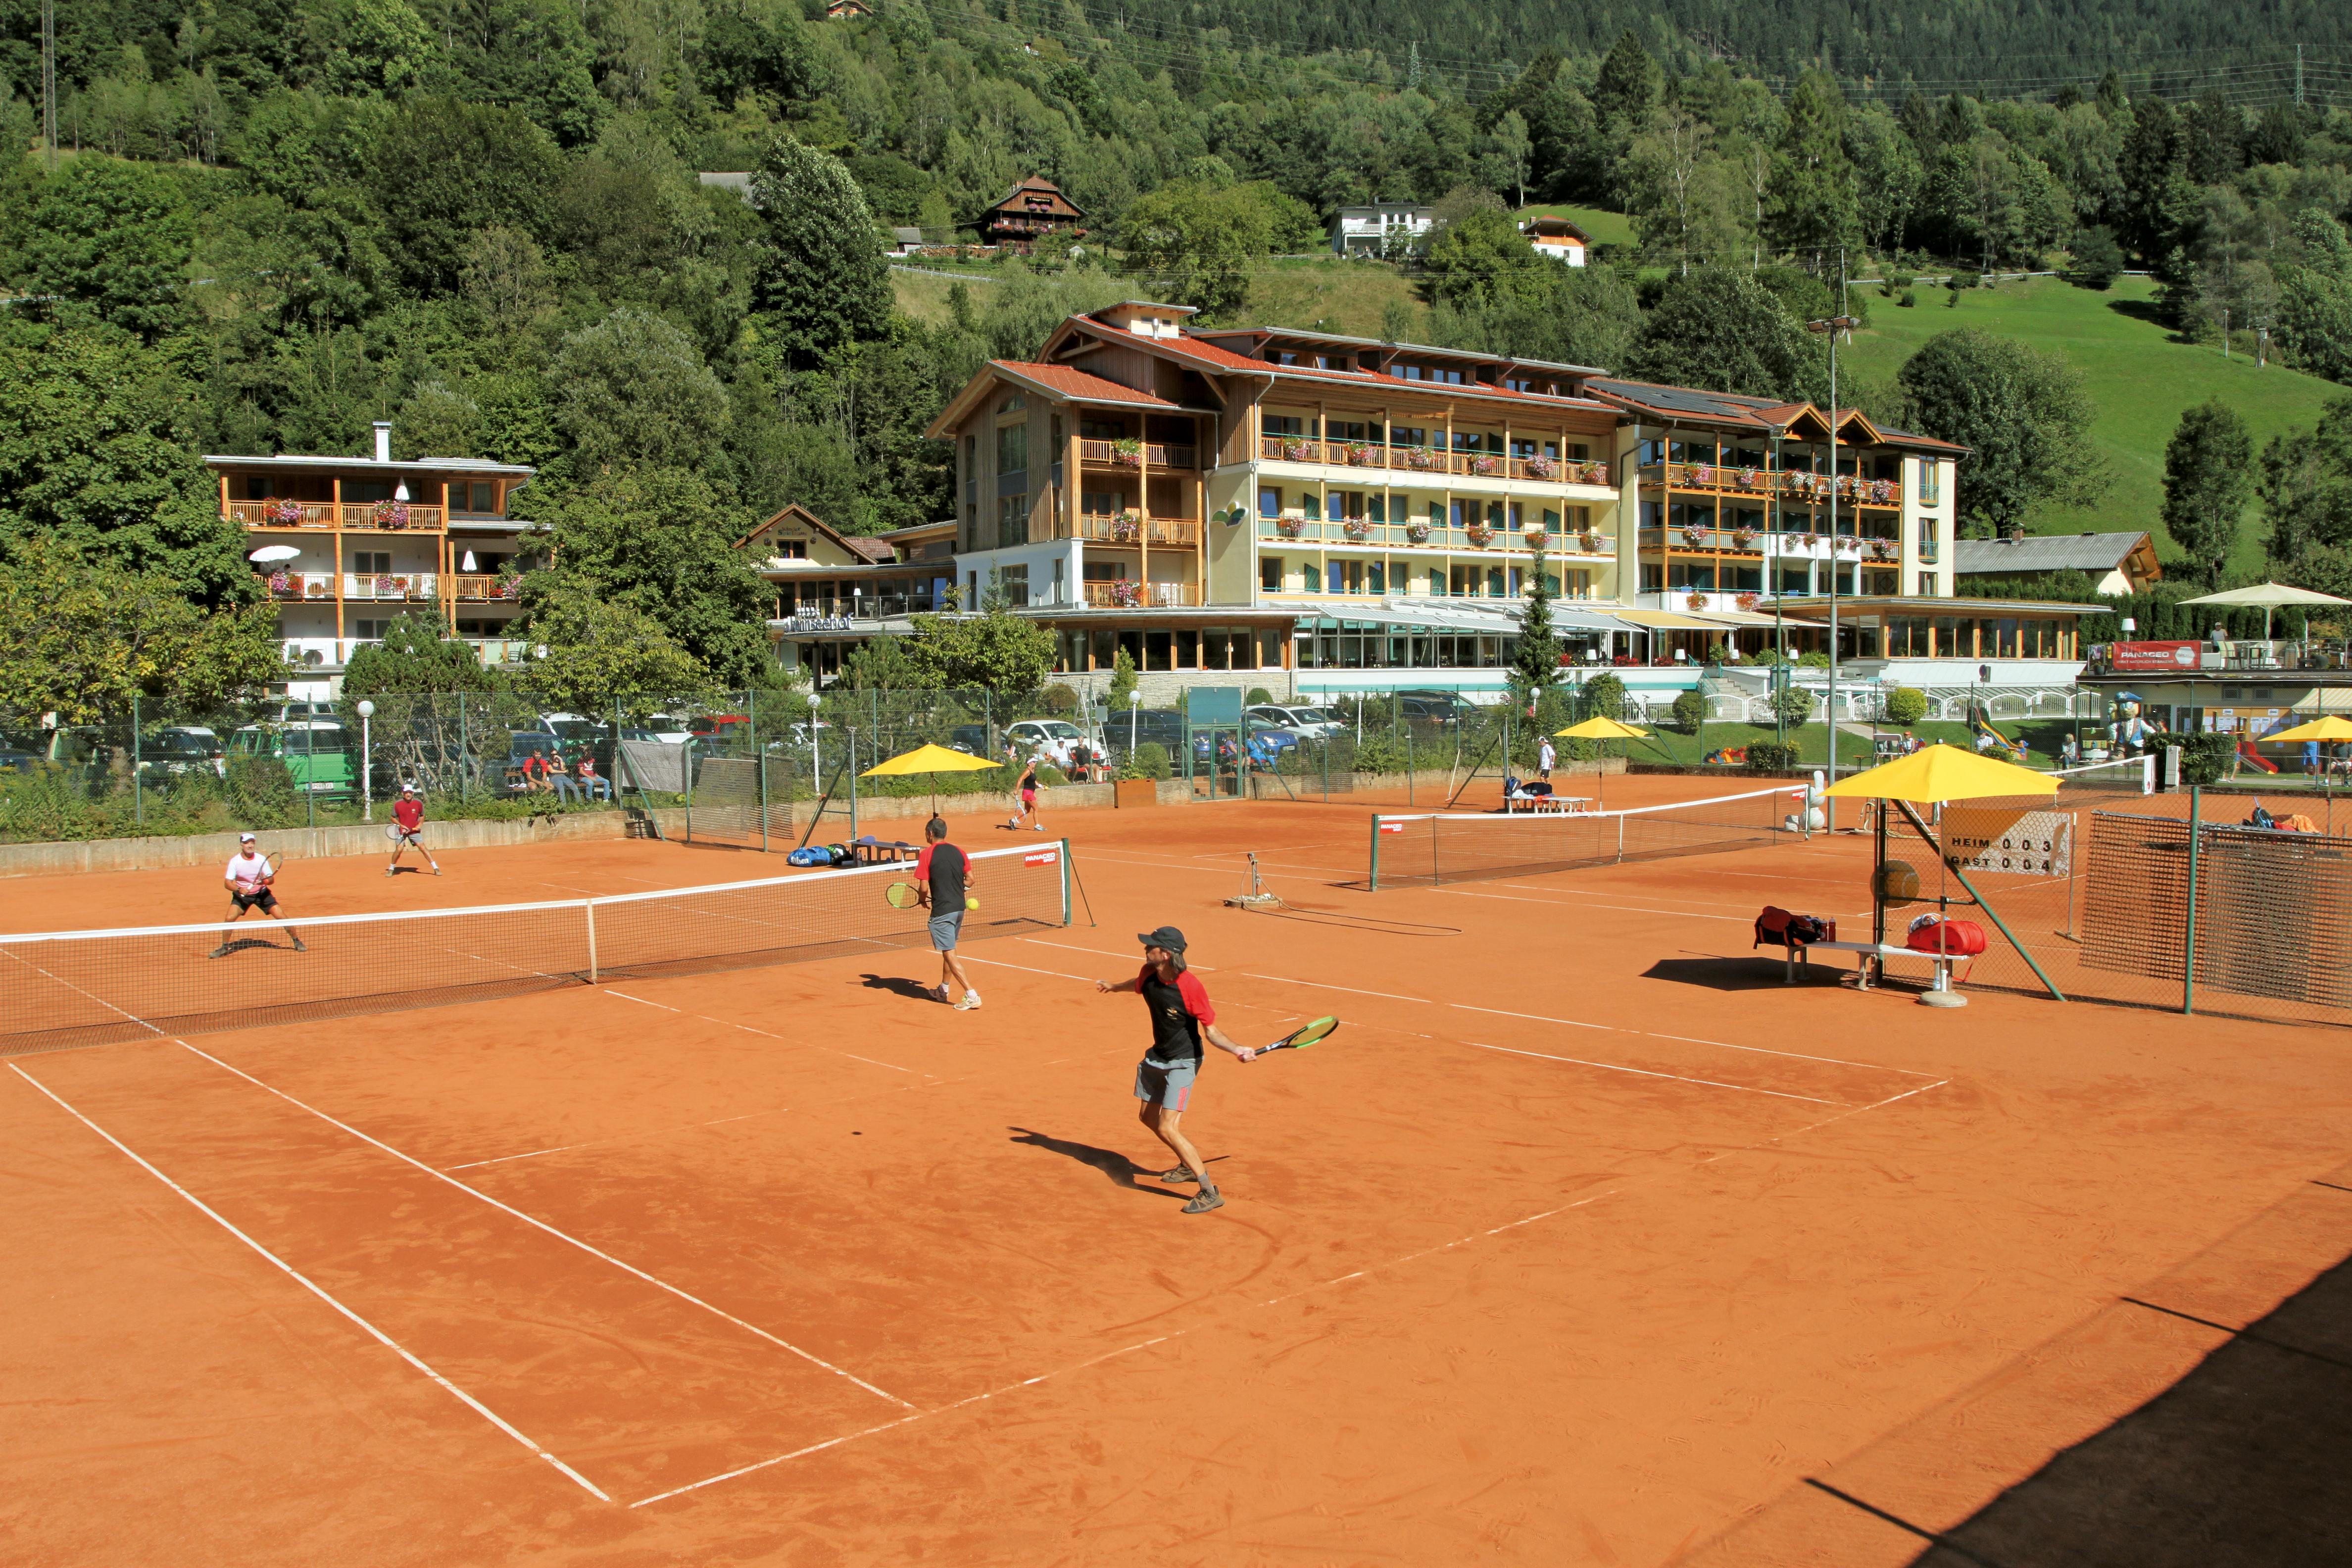 4-Sterne Tennishotel am Kärntner See